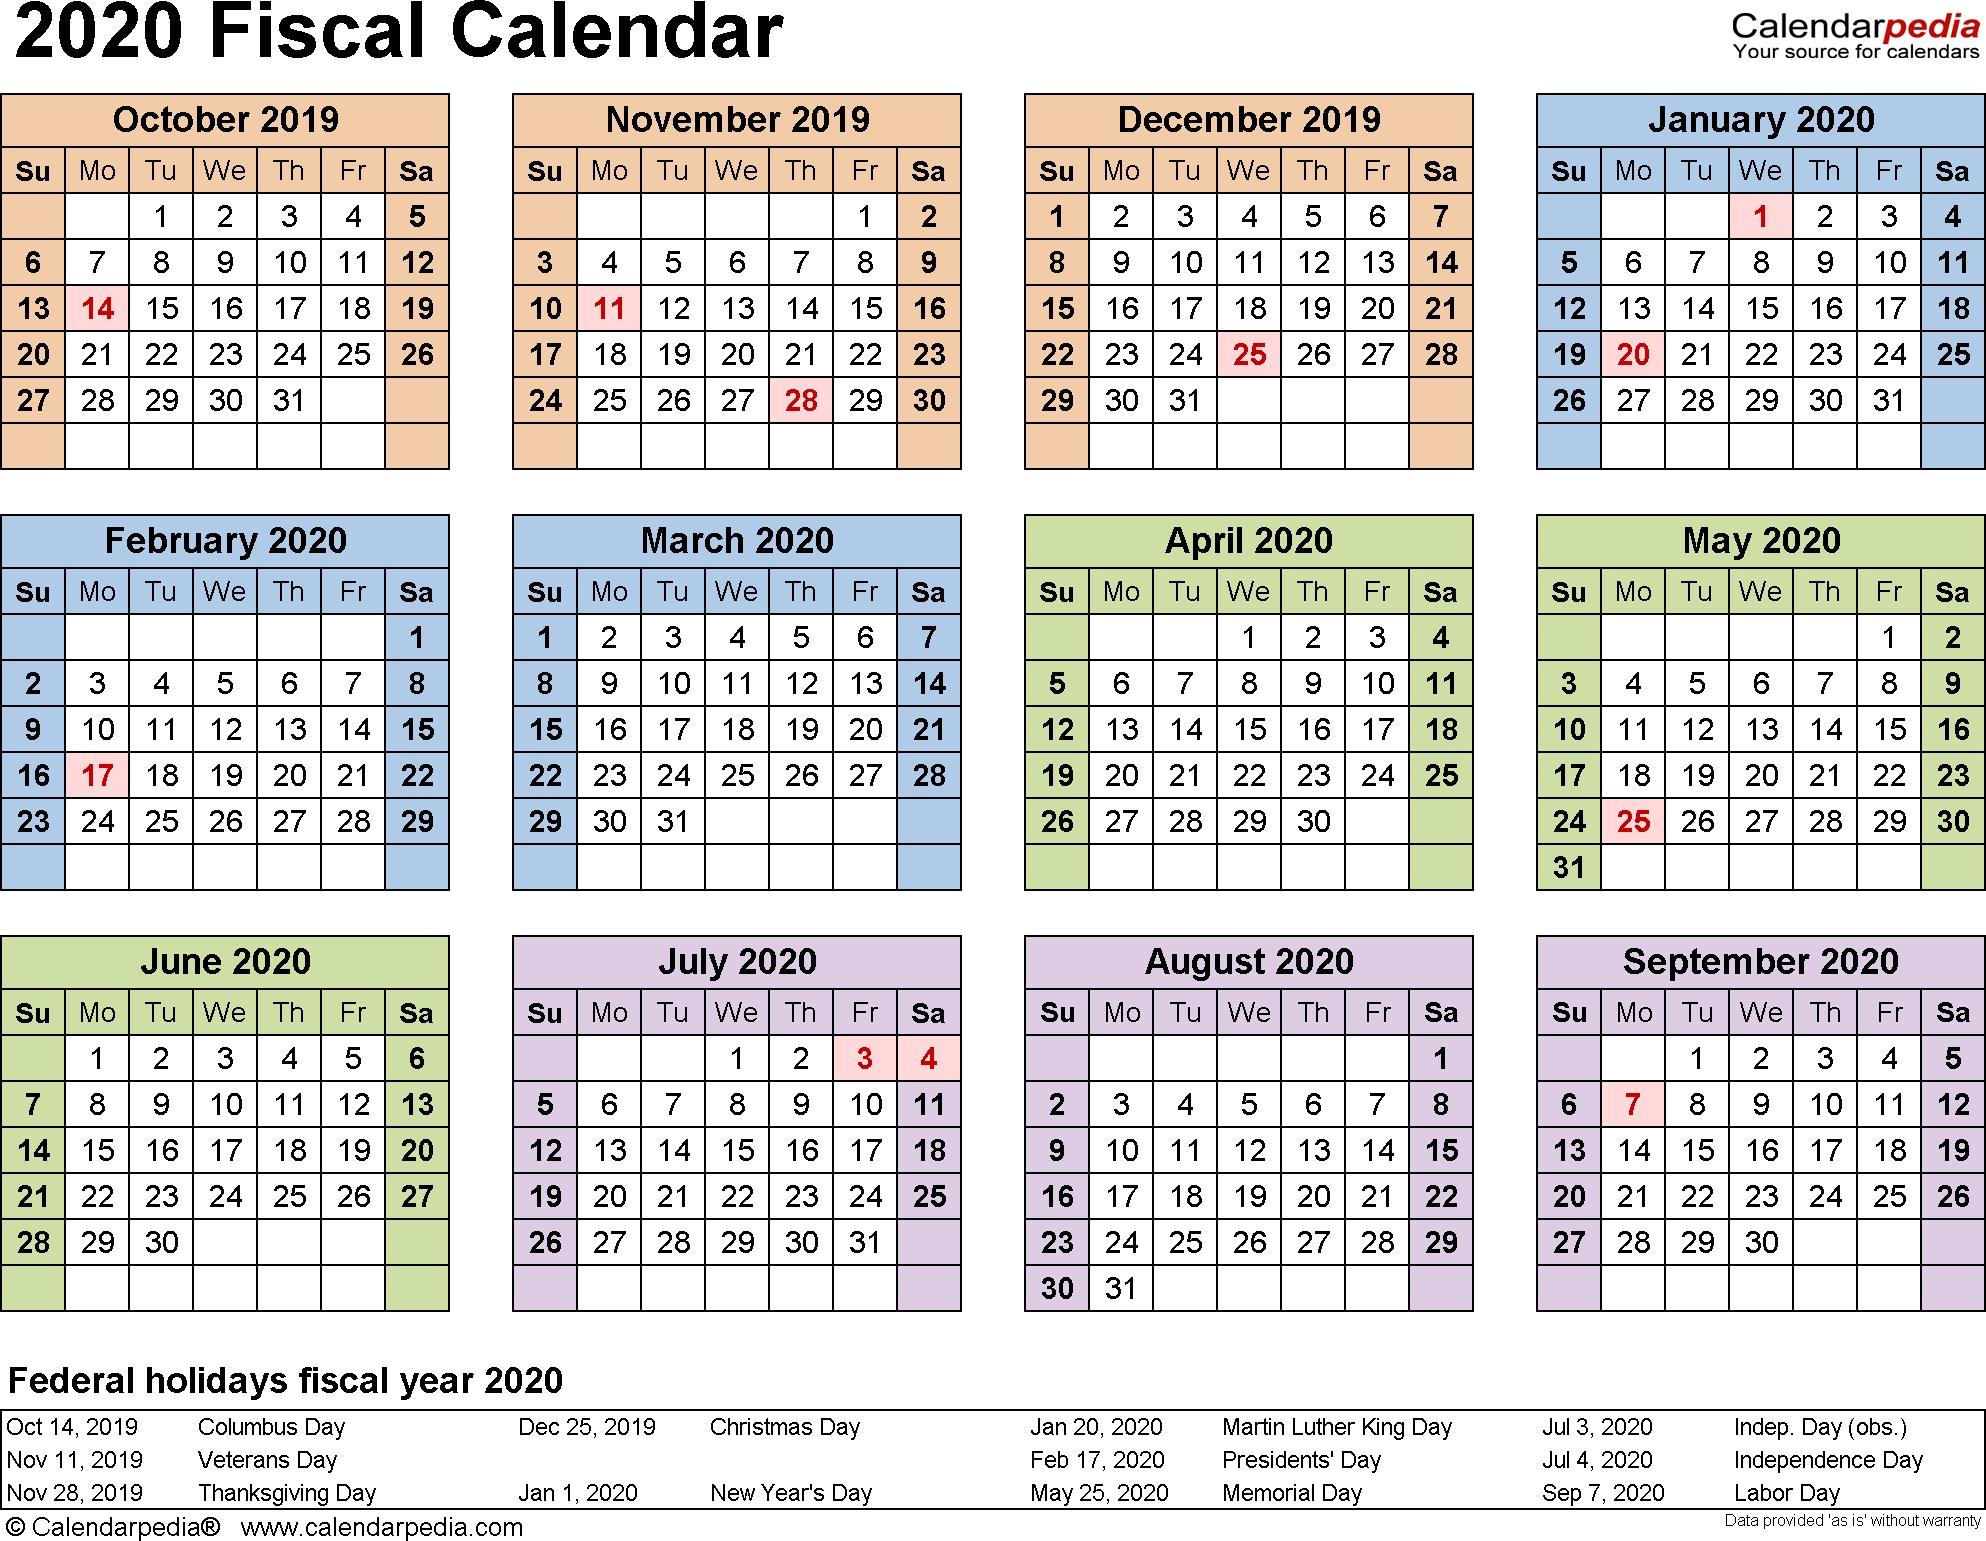 Fiscal Calendars 2020 As Free Printable Pdf Templates  Calendar Gov Au 2020 Financial Year